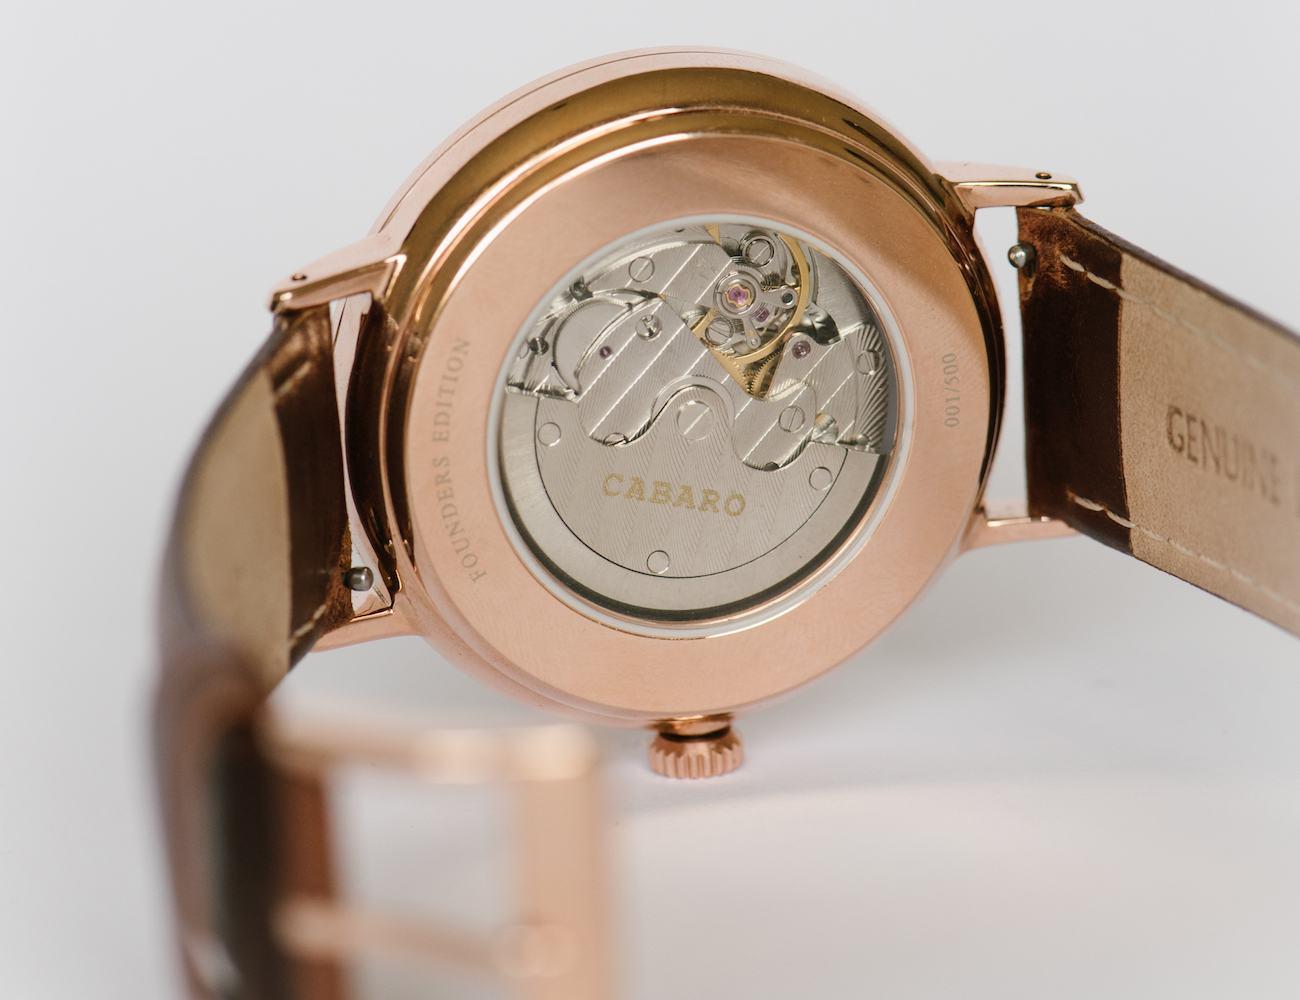 CABARO Swiss Automatic and Quartz Watches